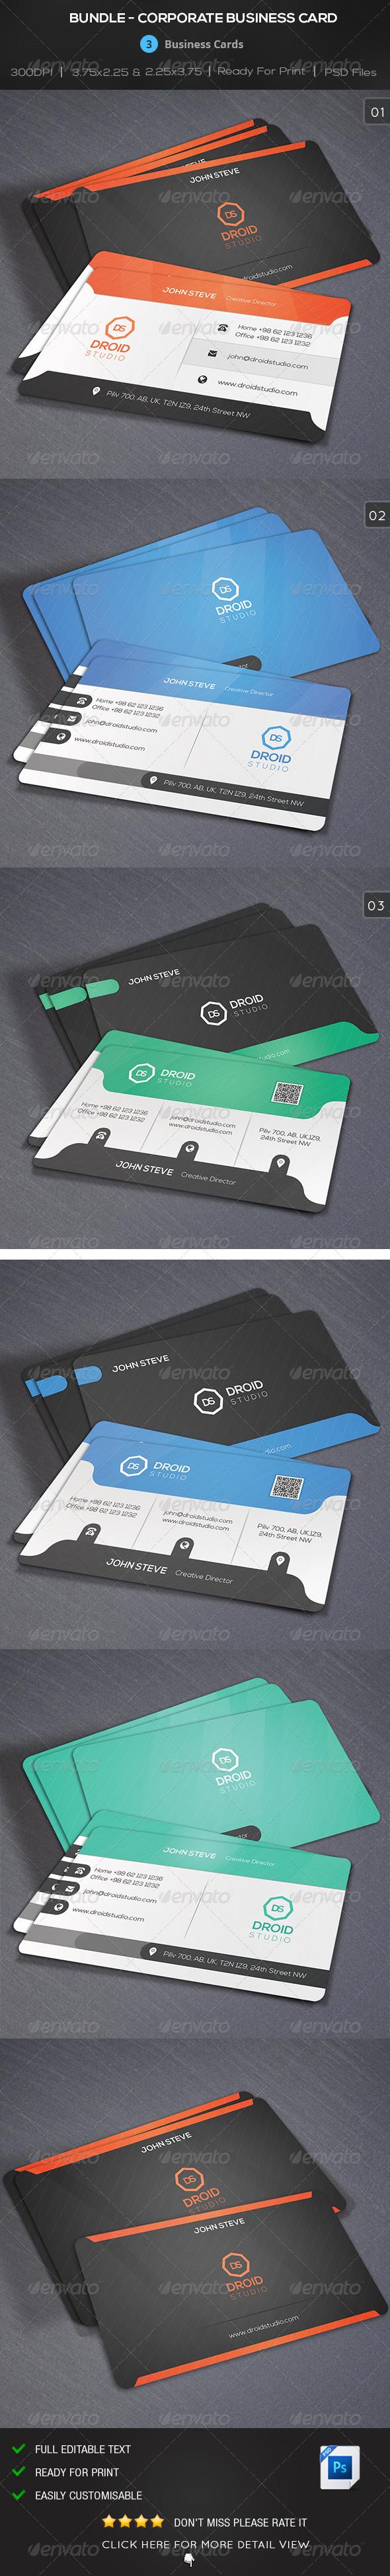 GraphicRiver Bundle Corporate Creative Business Card 8776967